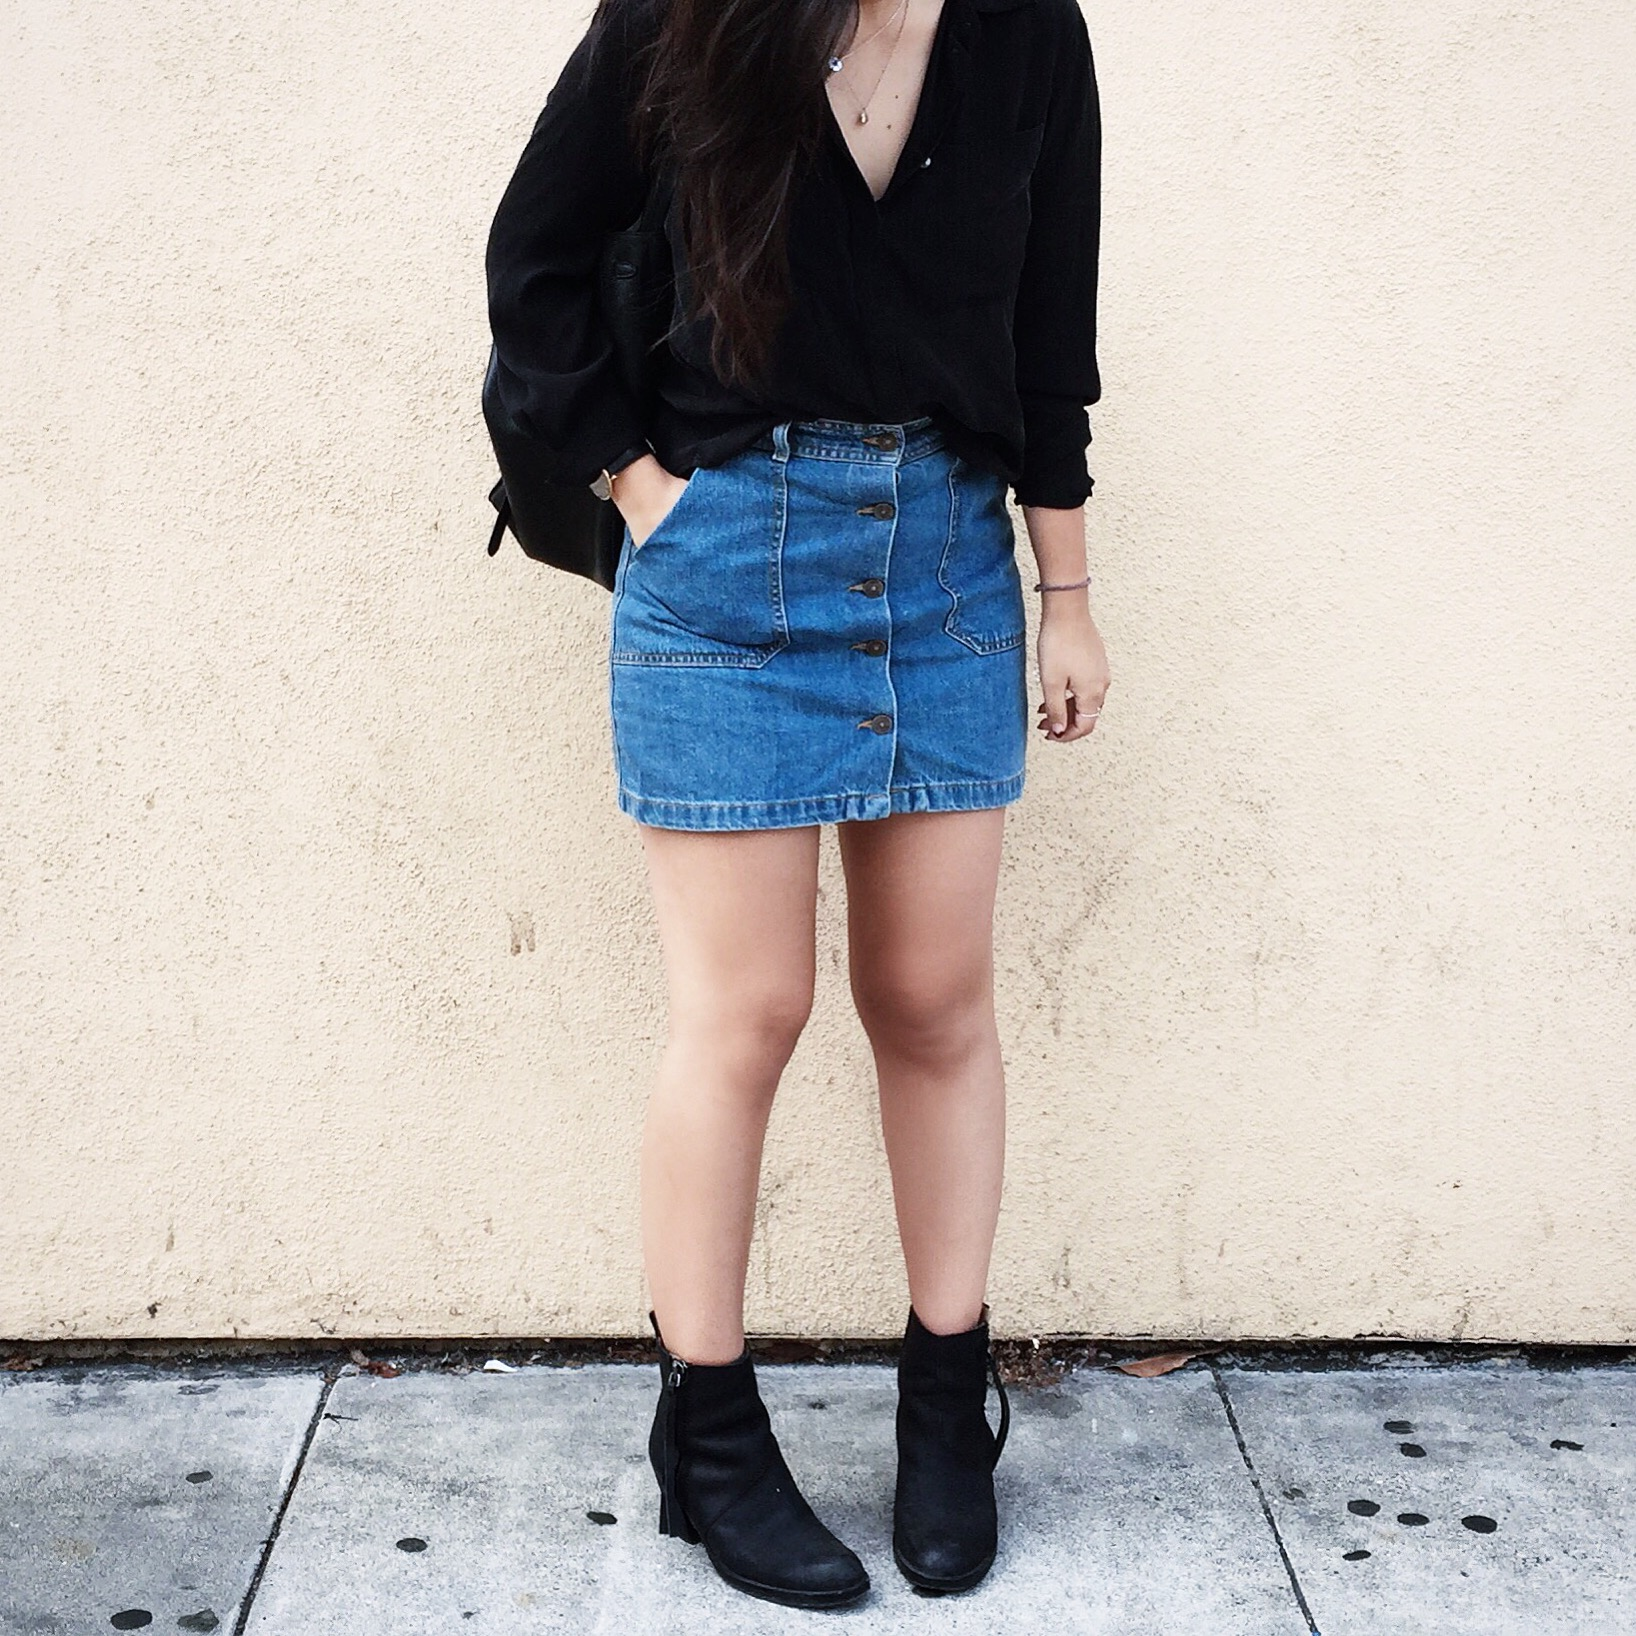 ZARA    denim skirt   / ACNE STUDIOS    Pistol booties   / J.CREW    silk pocket   blouse